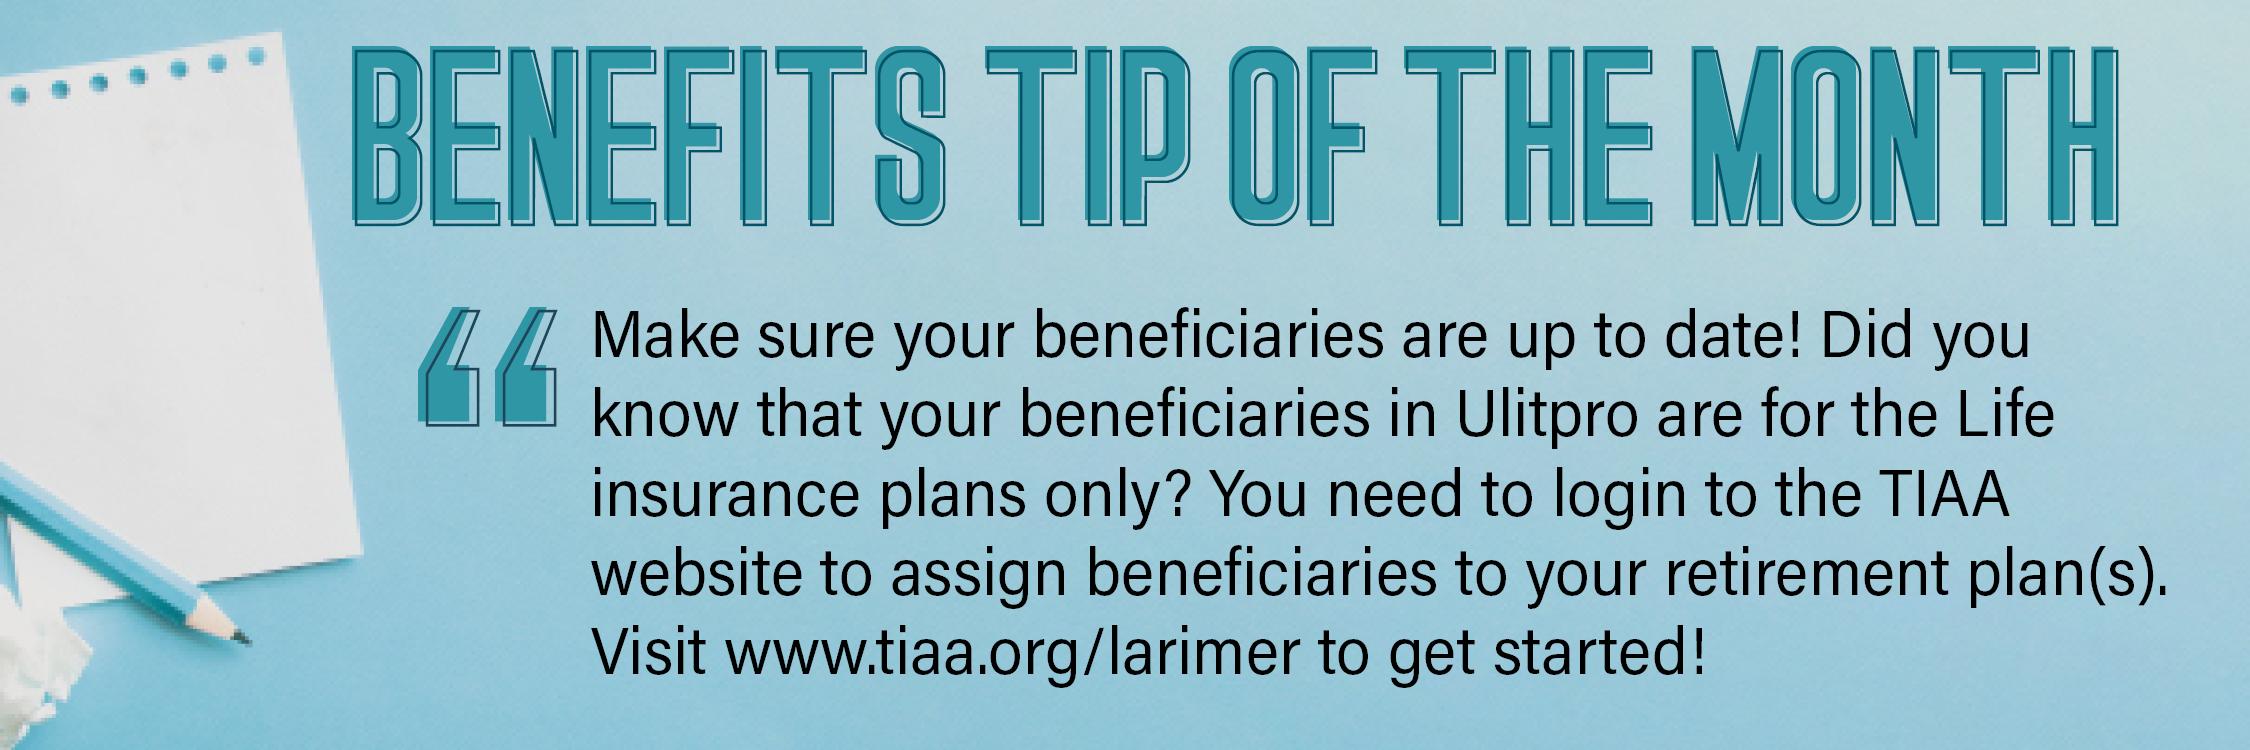 Image 2: Benefits